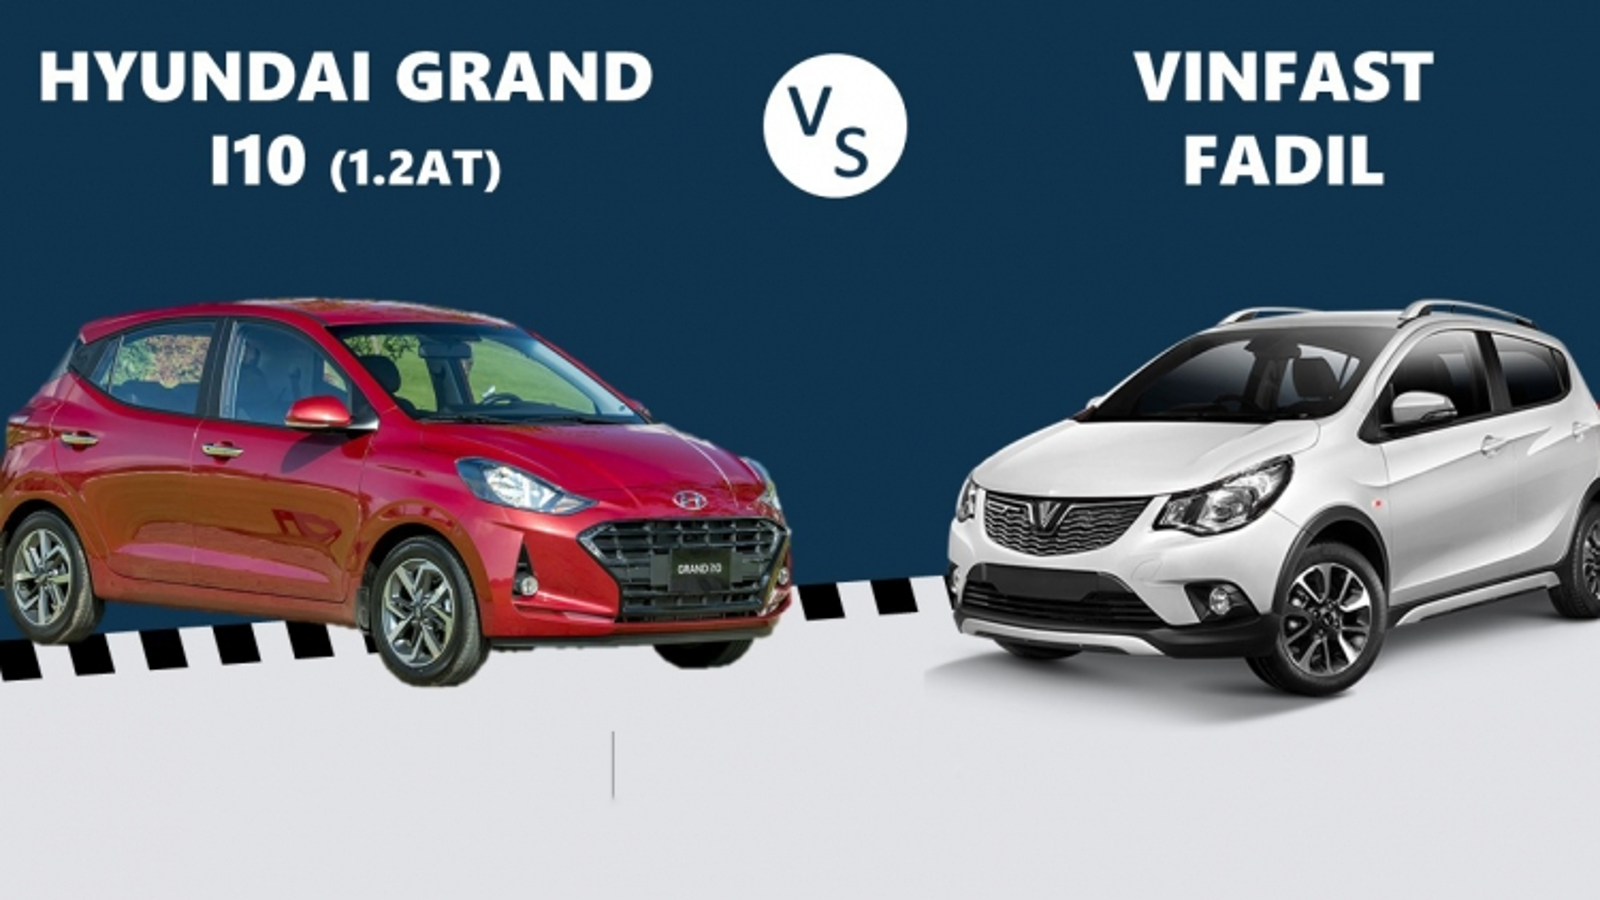 Mua Hyundai Grand i10 mới hay VinFast Fadil với 400 triệu đồng?